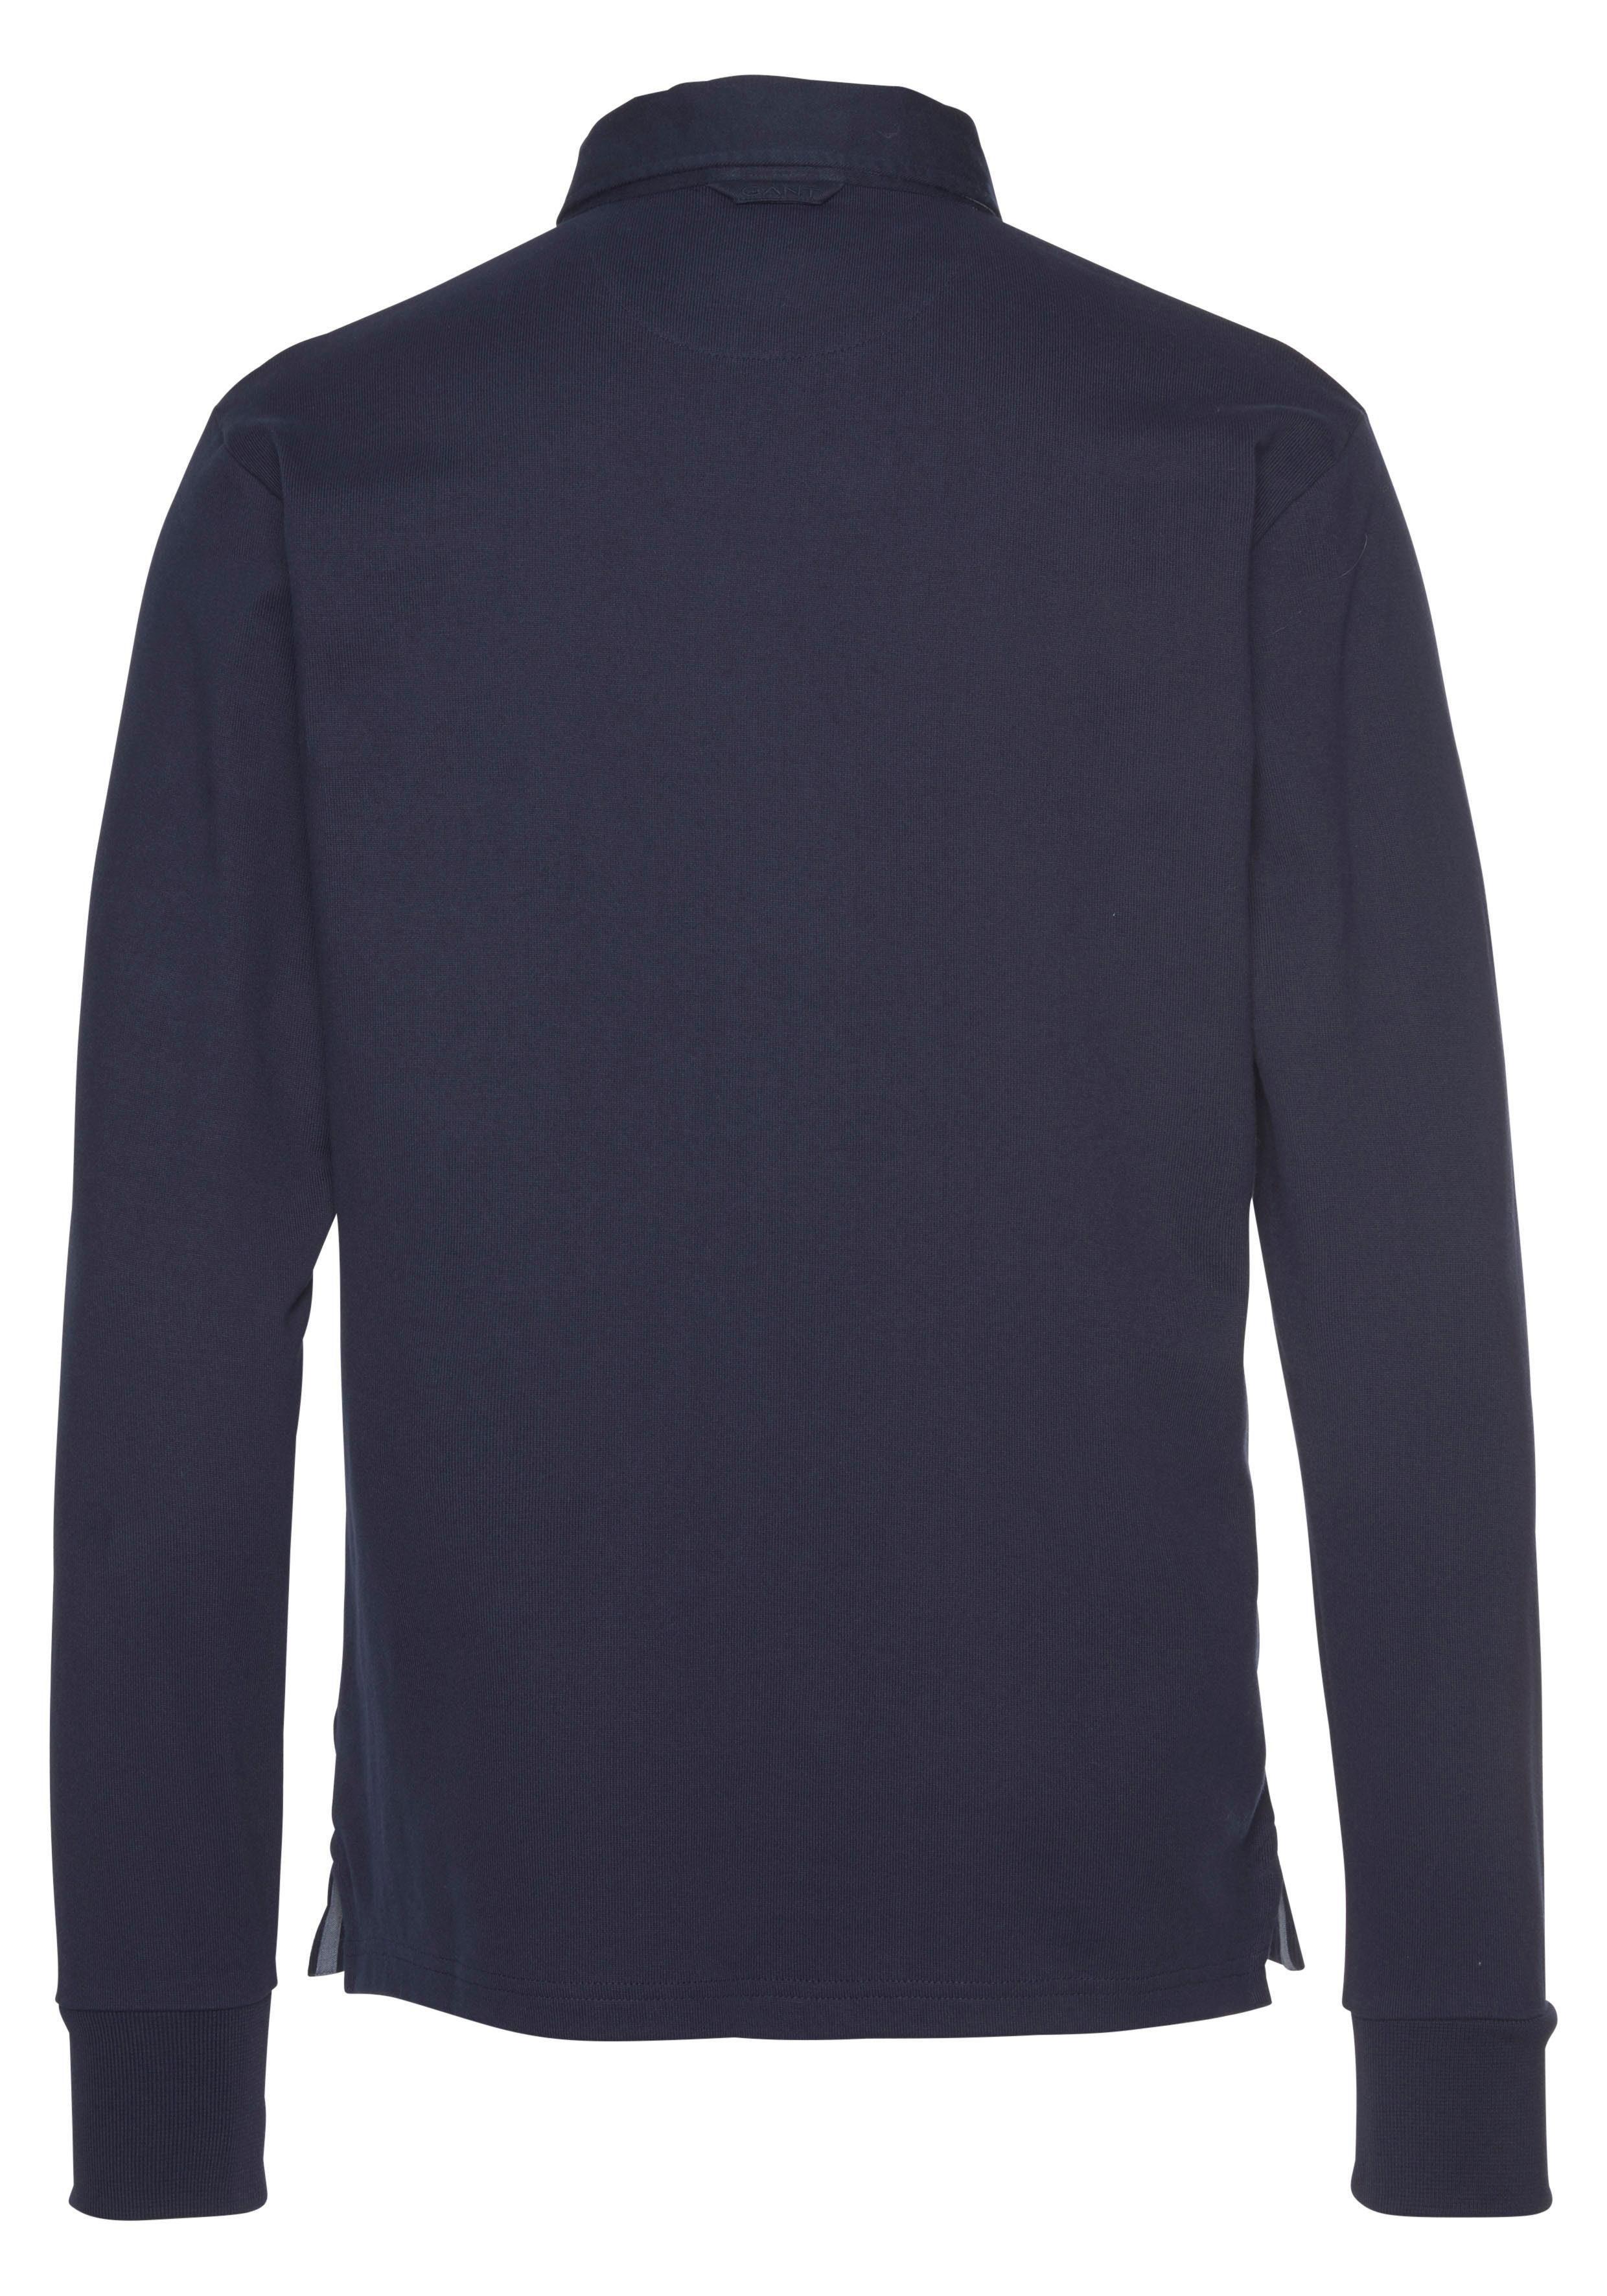 Gant Langarm-Poloshirt | Bekleidung > Shirts > Langarm Shirts | Blau | Gant